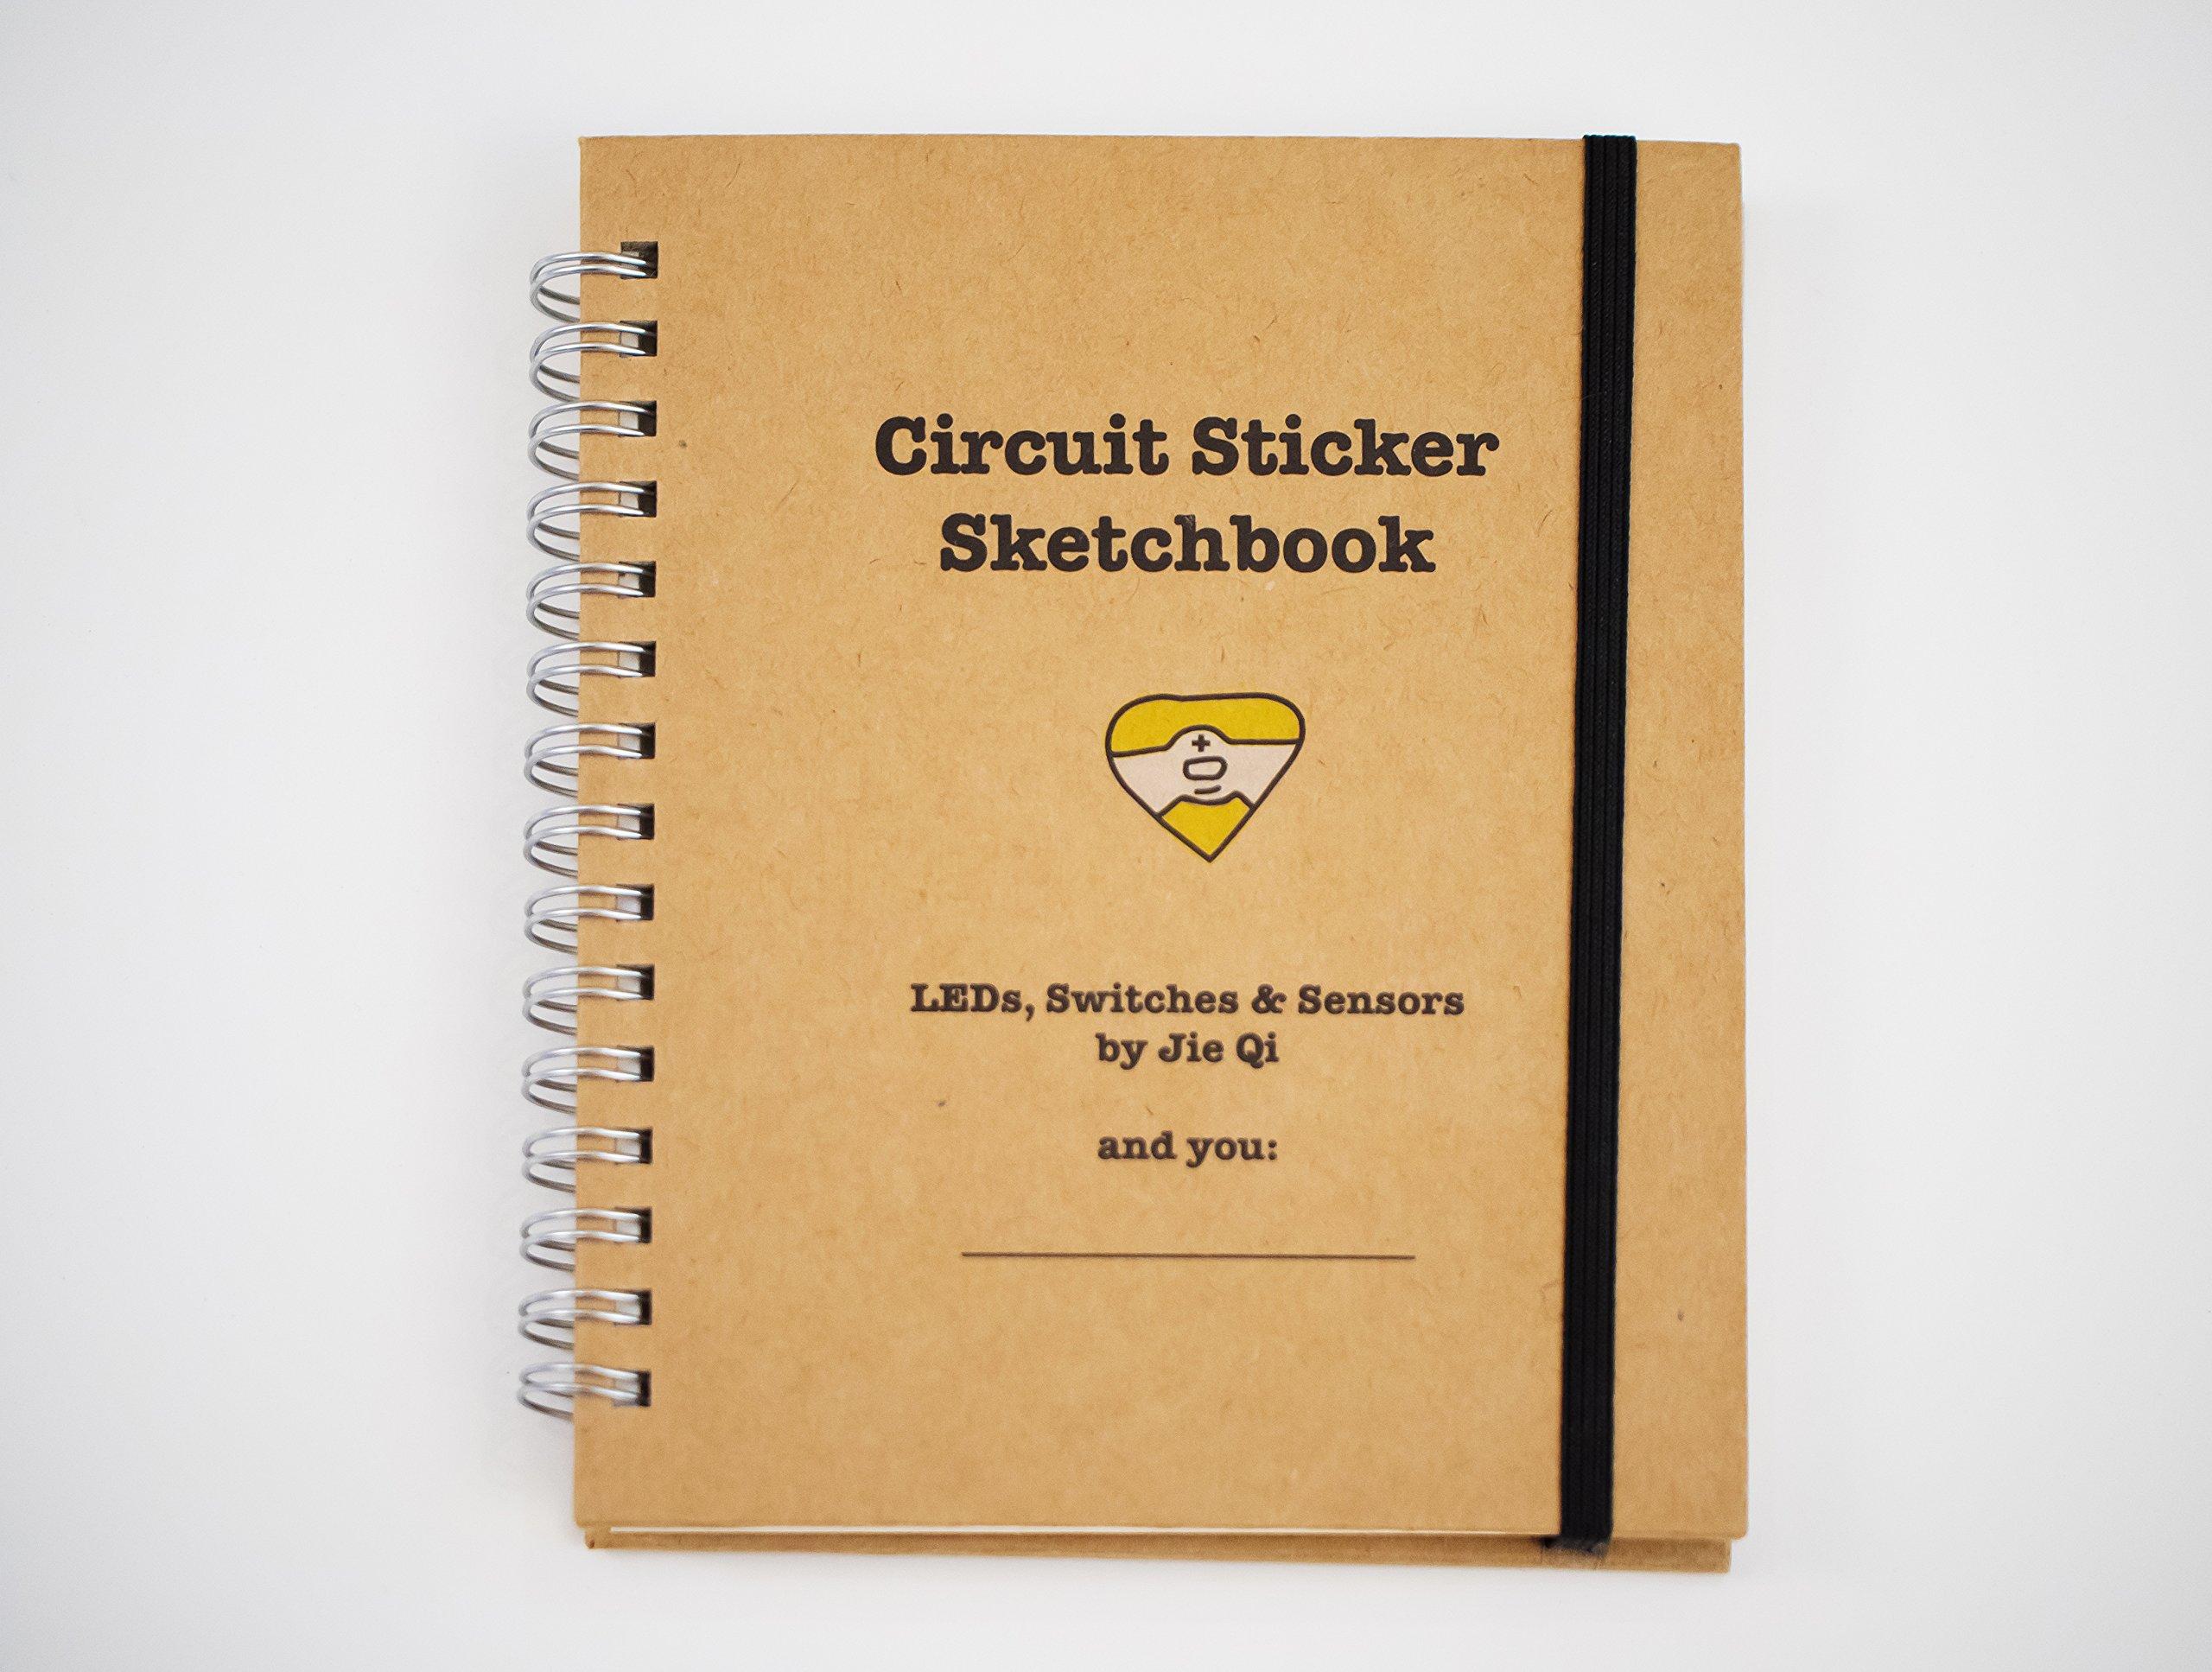 Chibitronics - Chibi Lights - LED Circuit Stickers STEM Starter Kit by Chibitronics (Image #1)